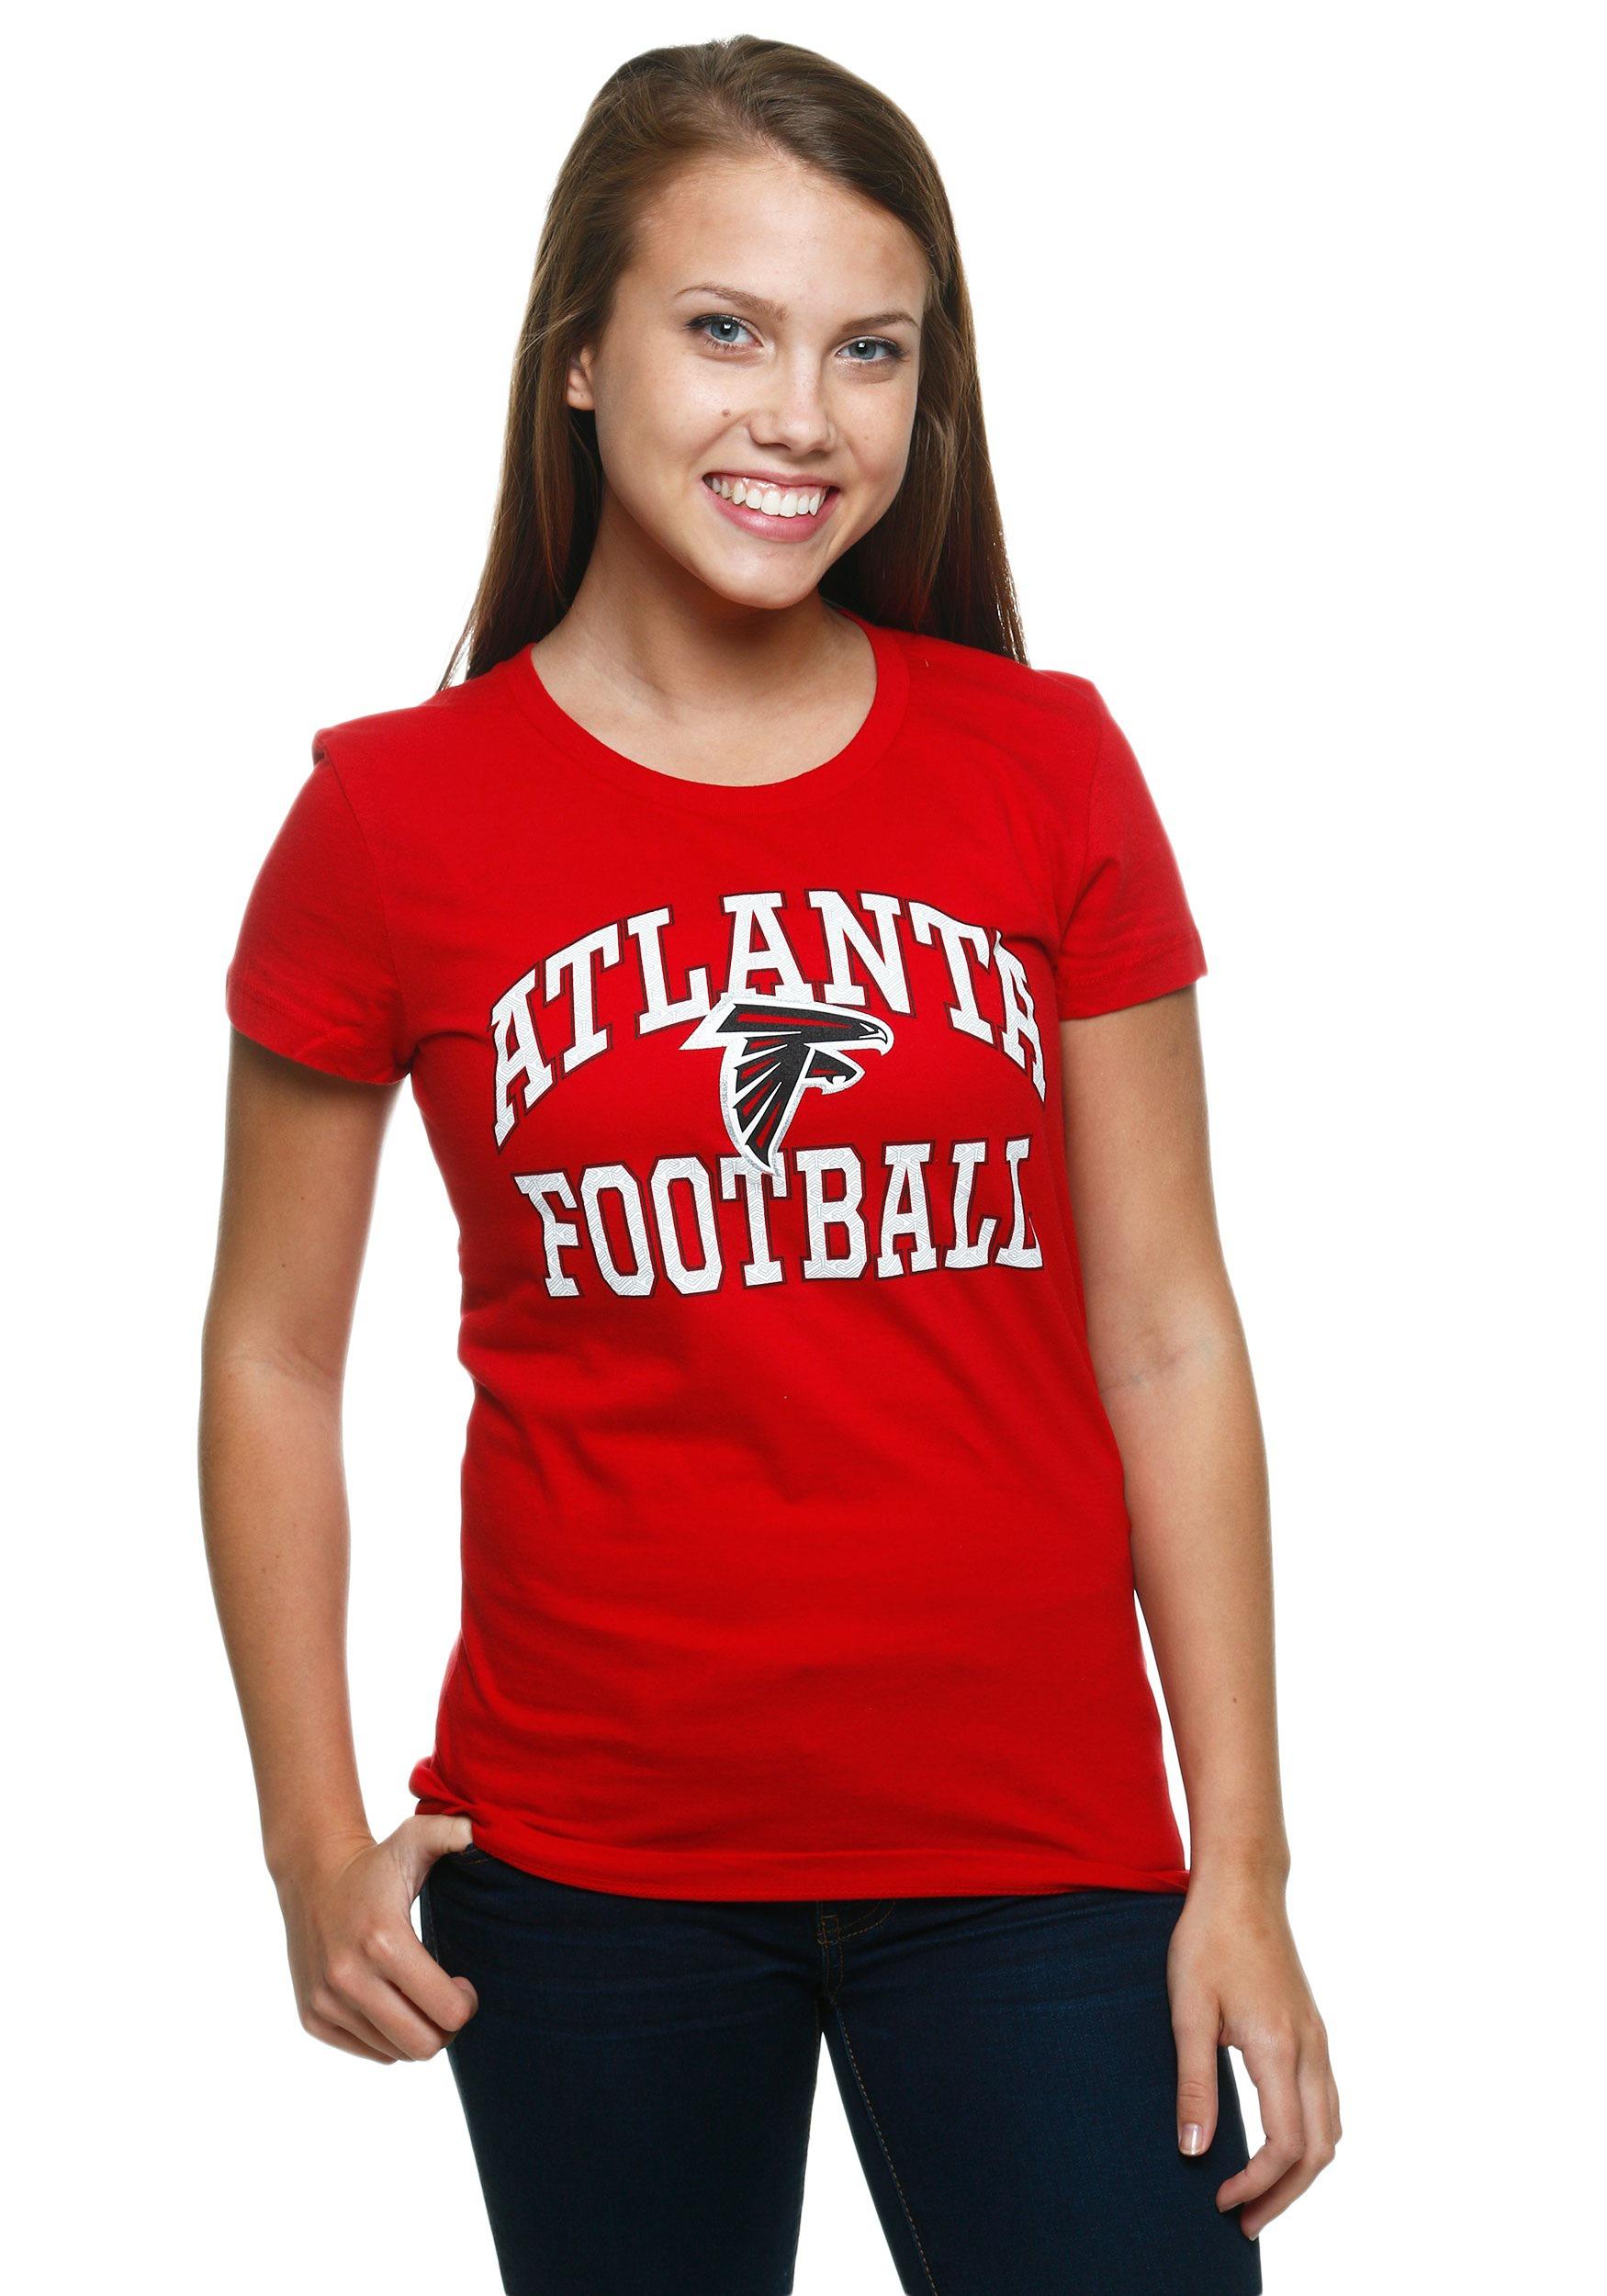 Atlanta Falcons Franchise Fit Women s T-Shirt b163266b32